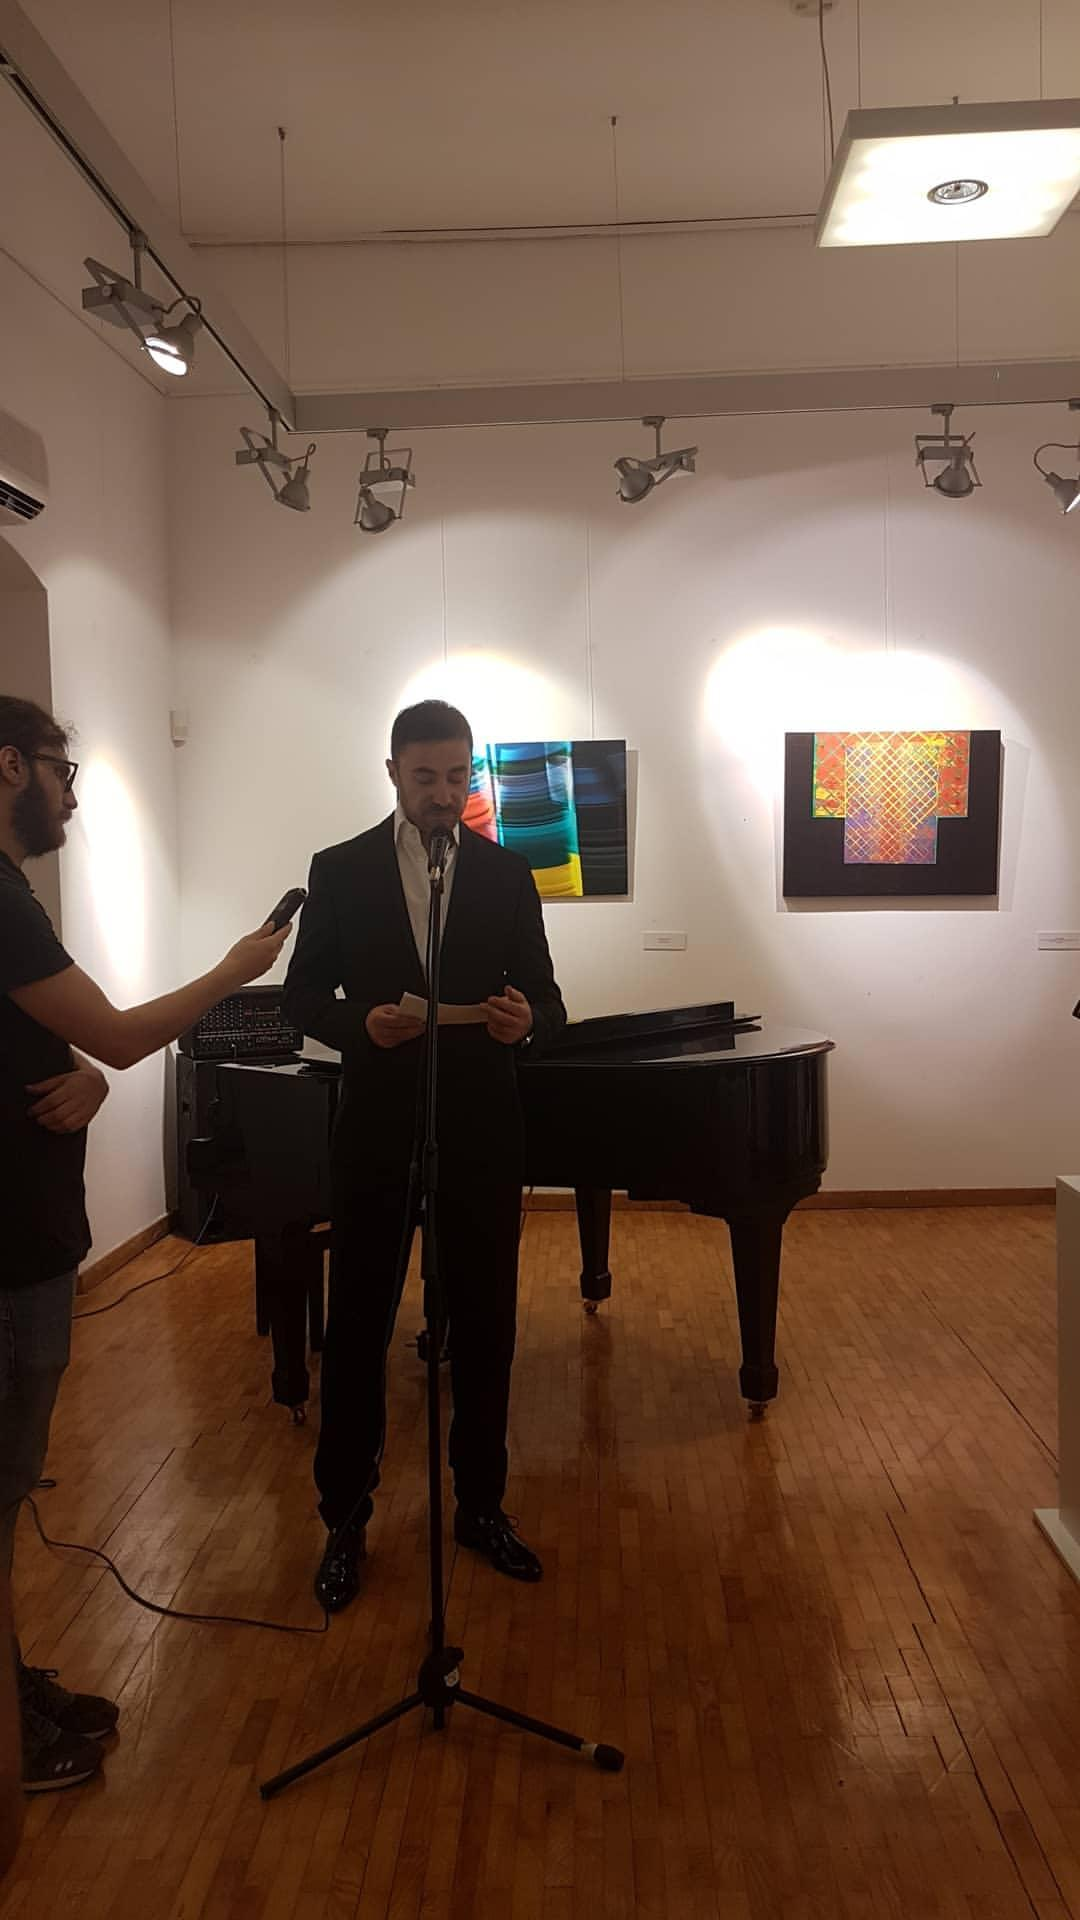 ministar kulture crne gore gospodin aleksandar bogdanovic na otvaranju izlozbe nova realnost budva 2019